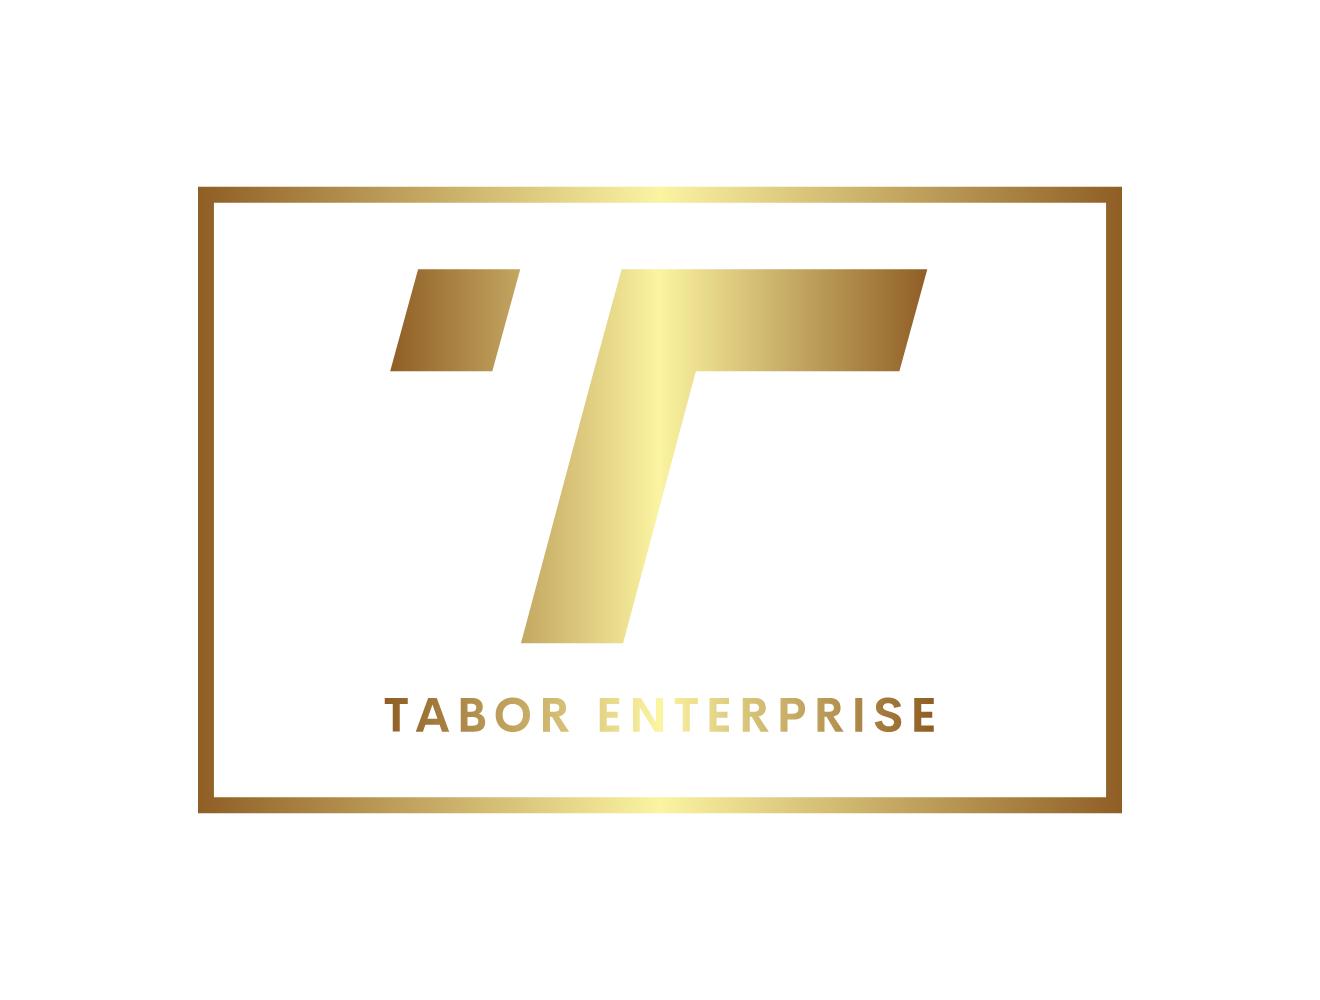 Tabor Enterprise